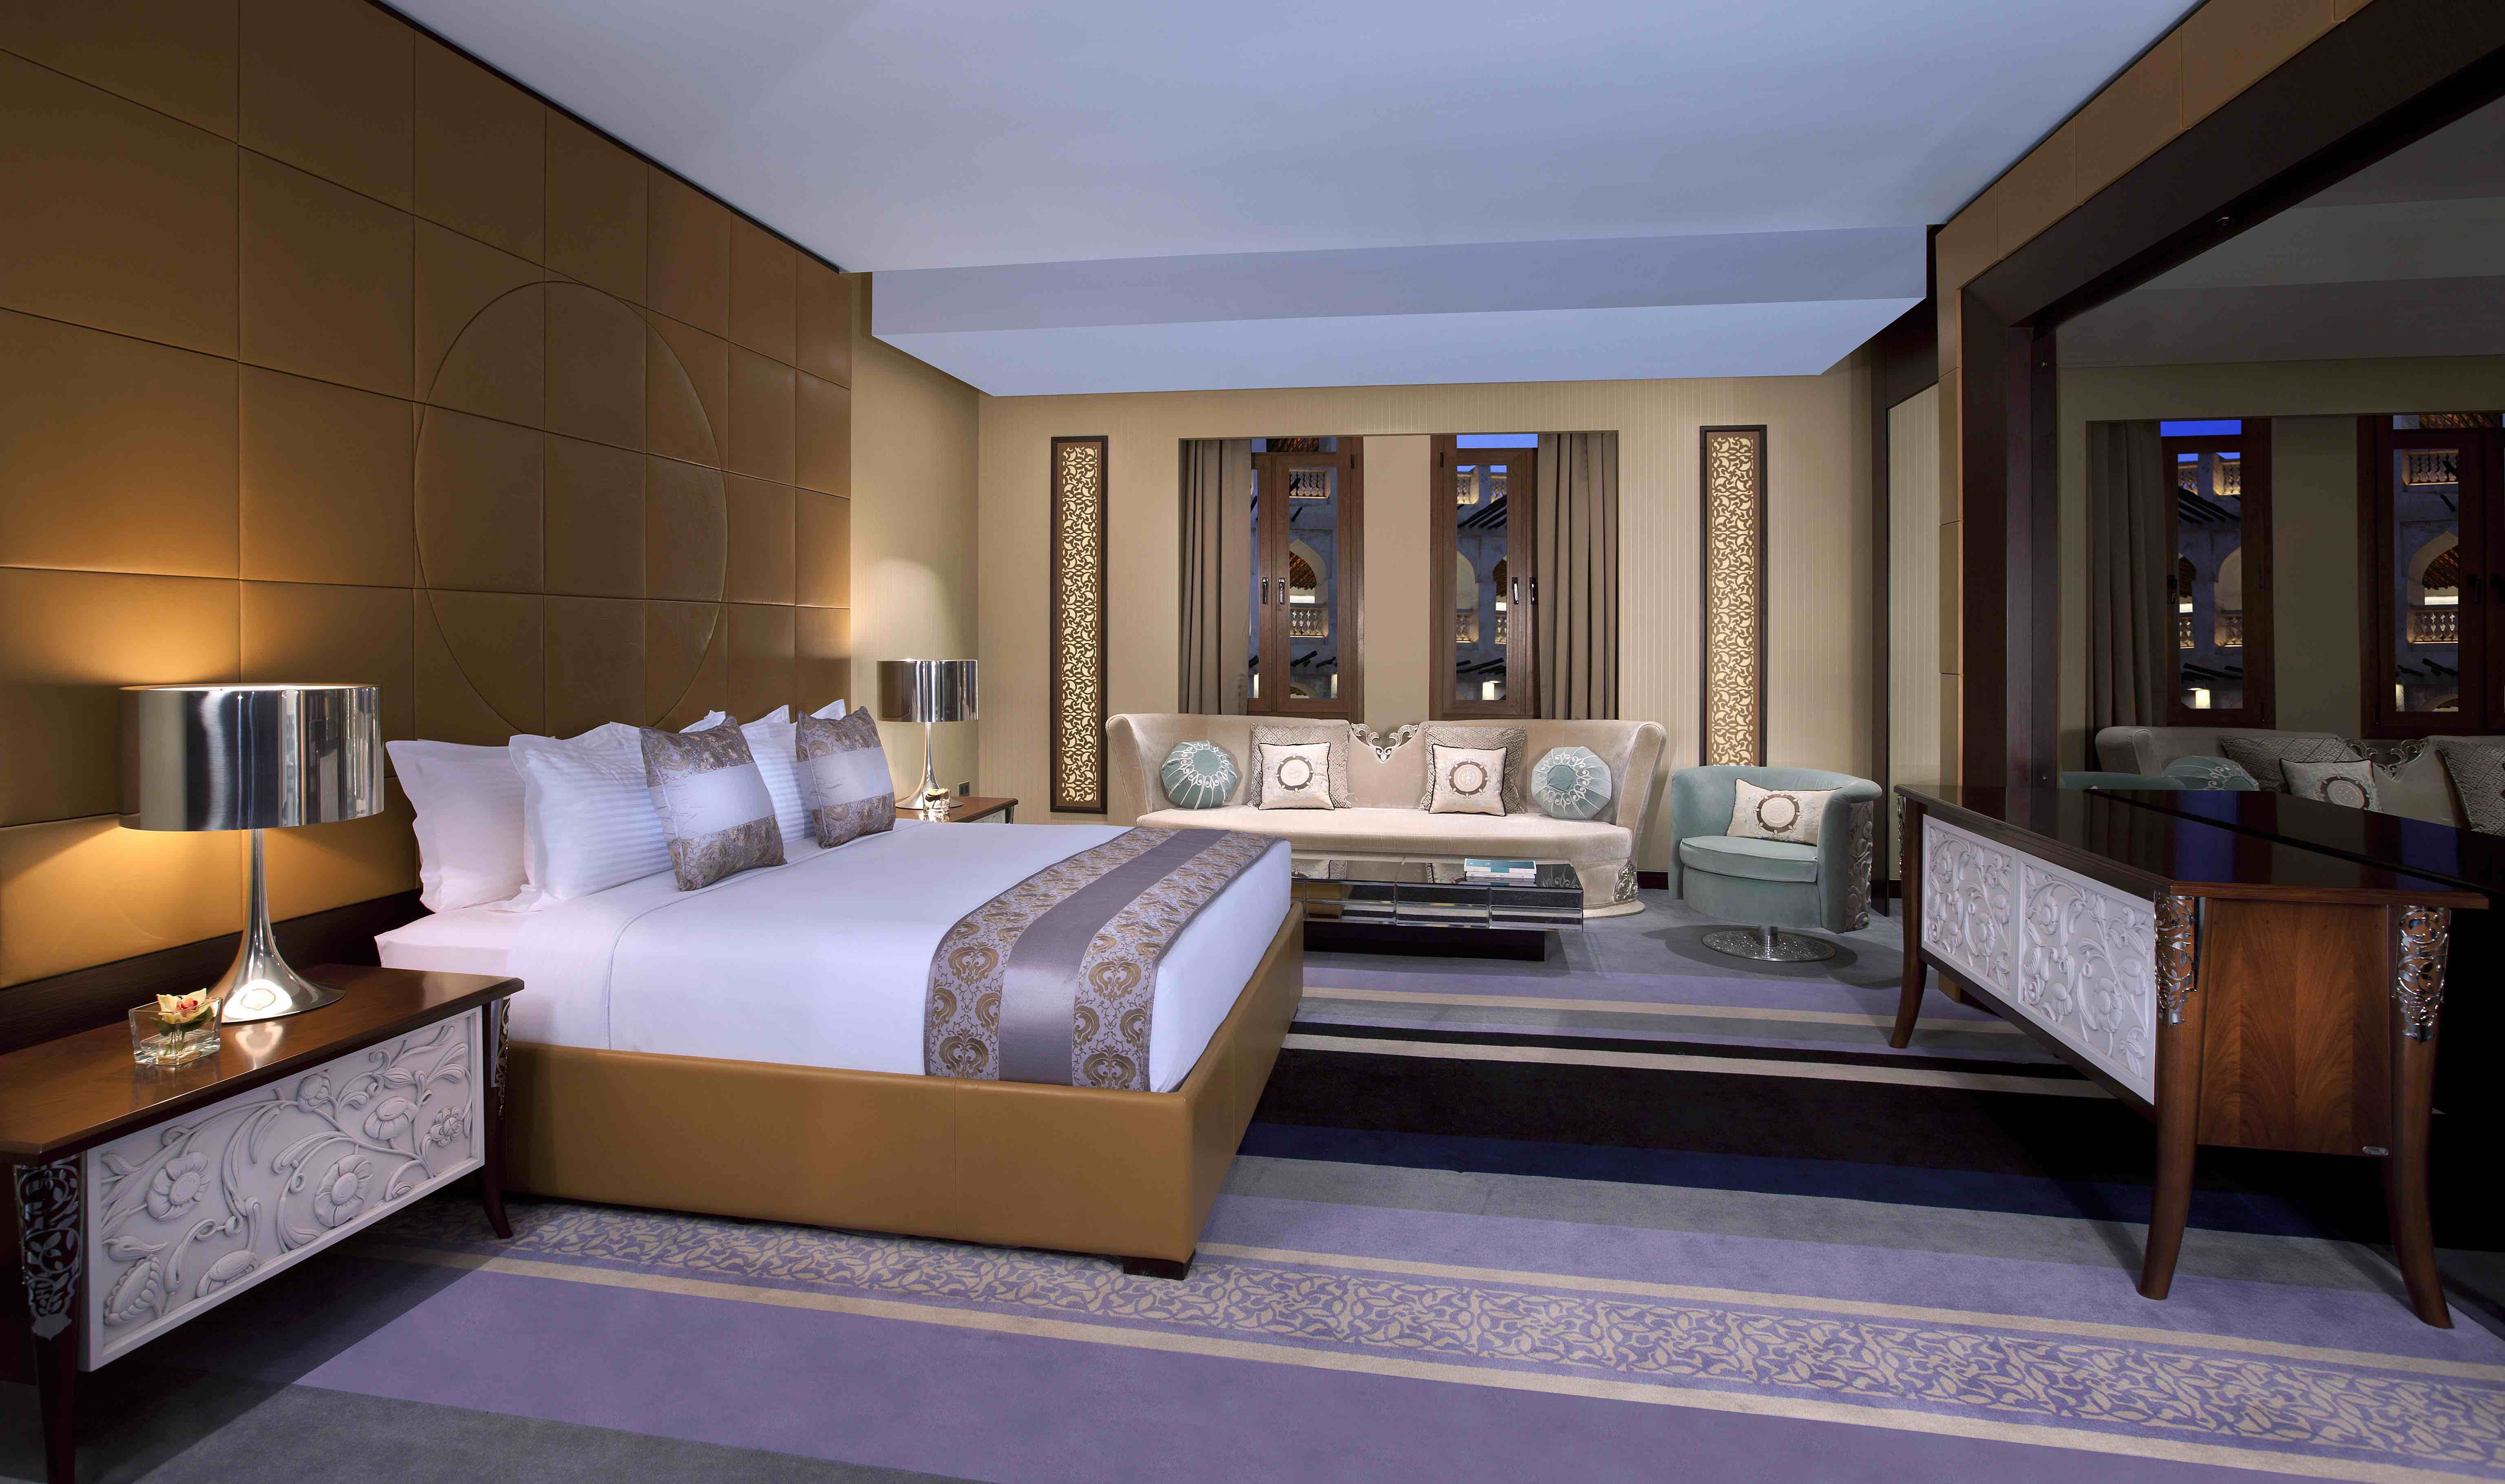 Souq waqif boutique hotels by tivoli haute grandeur for Boutique hotel gargano